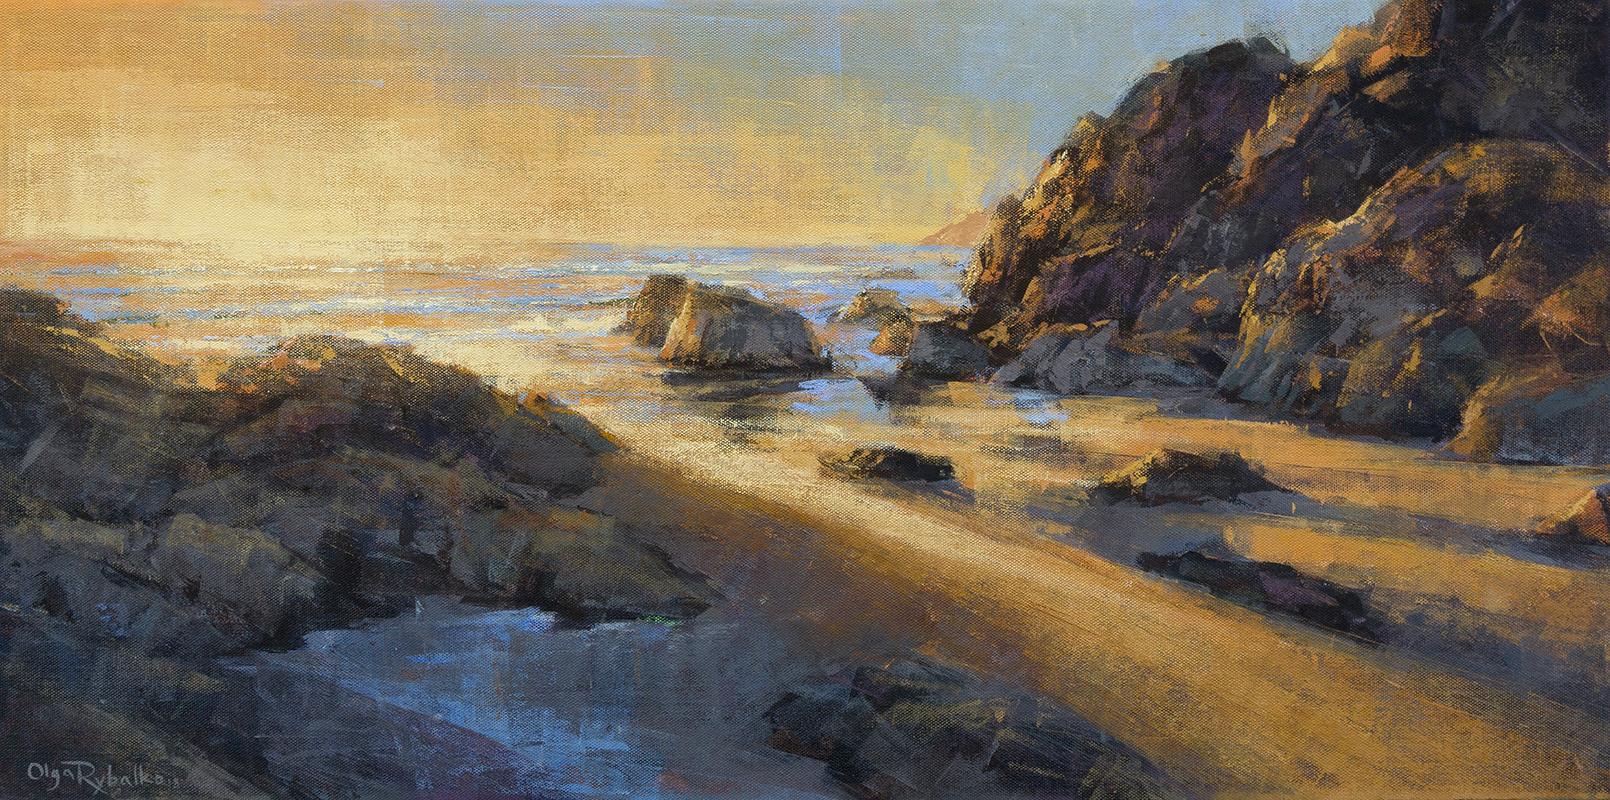 olga rybalko art - pacific rim - sage wave - landscape painting-4.jpg